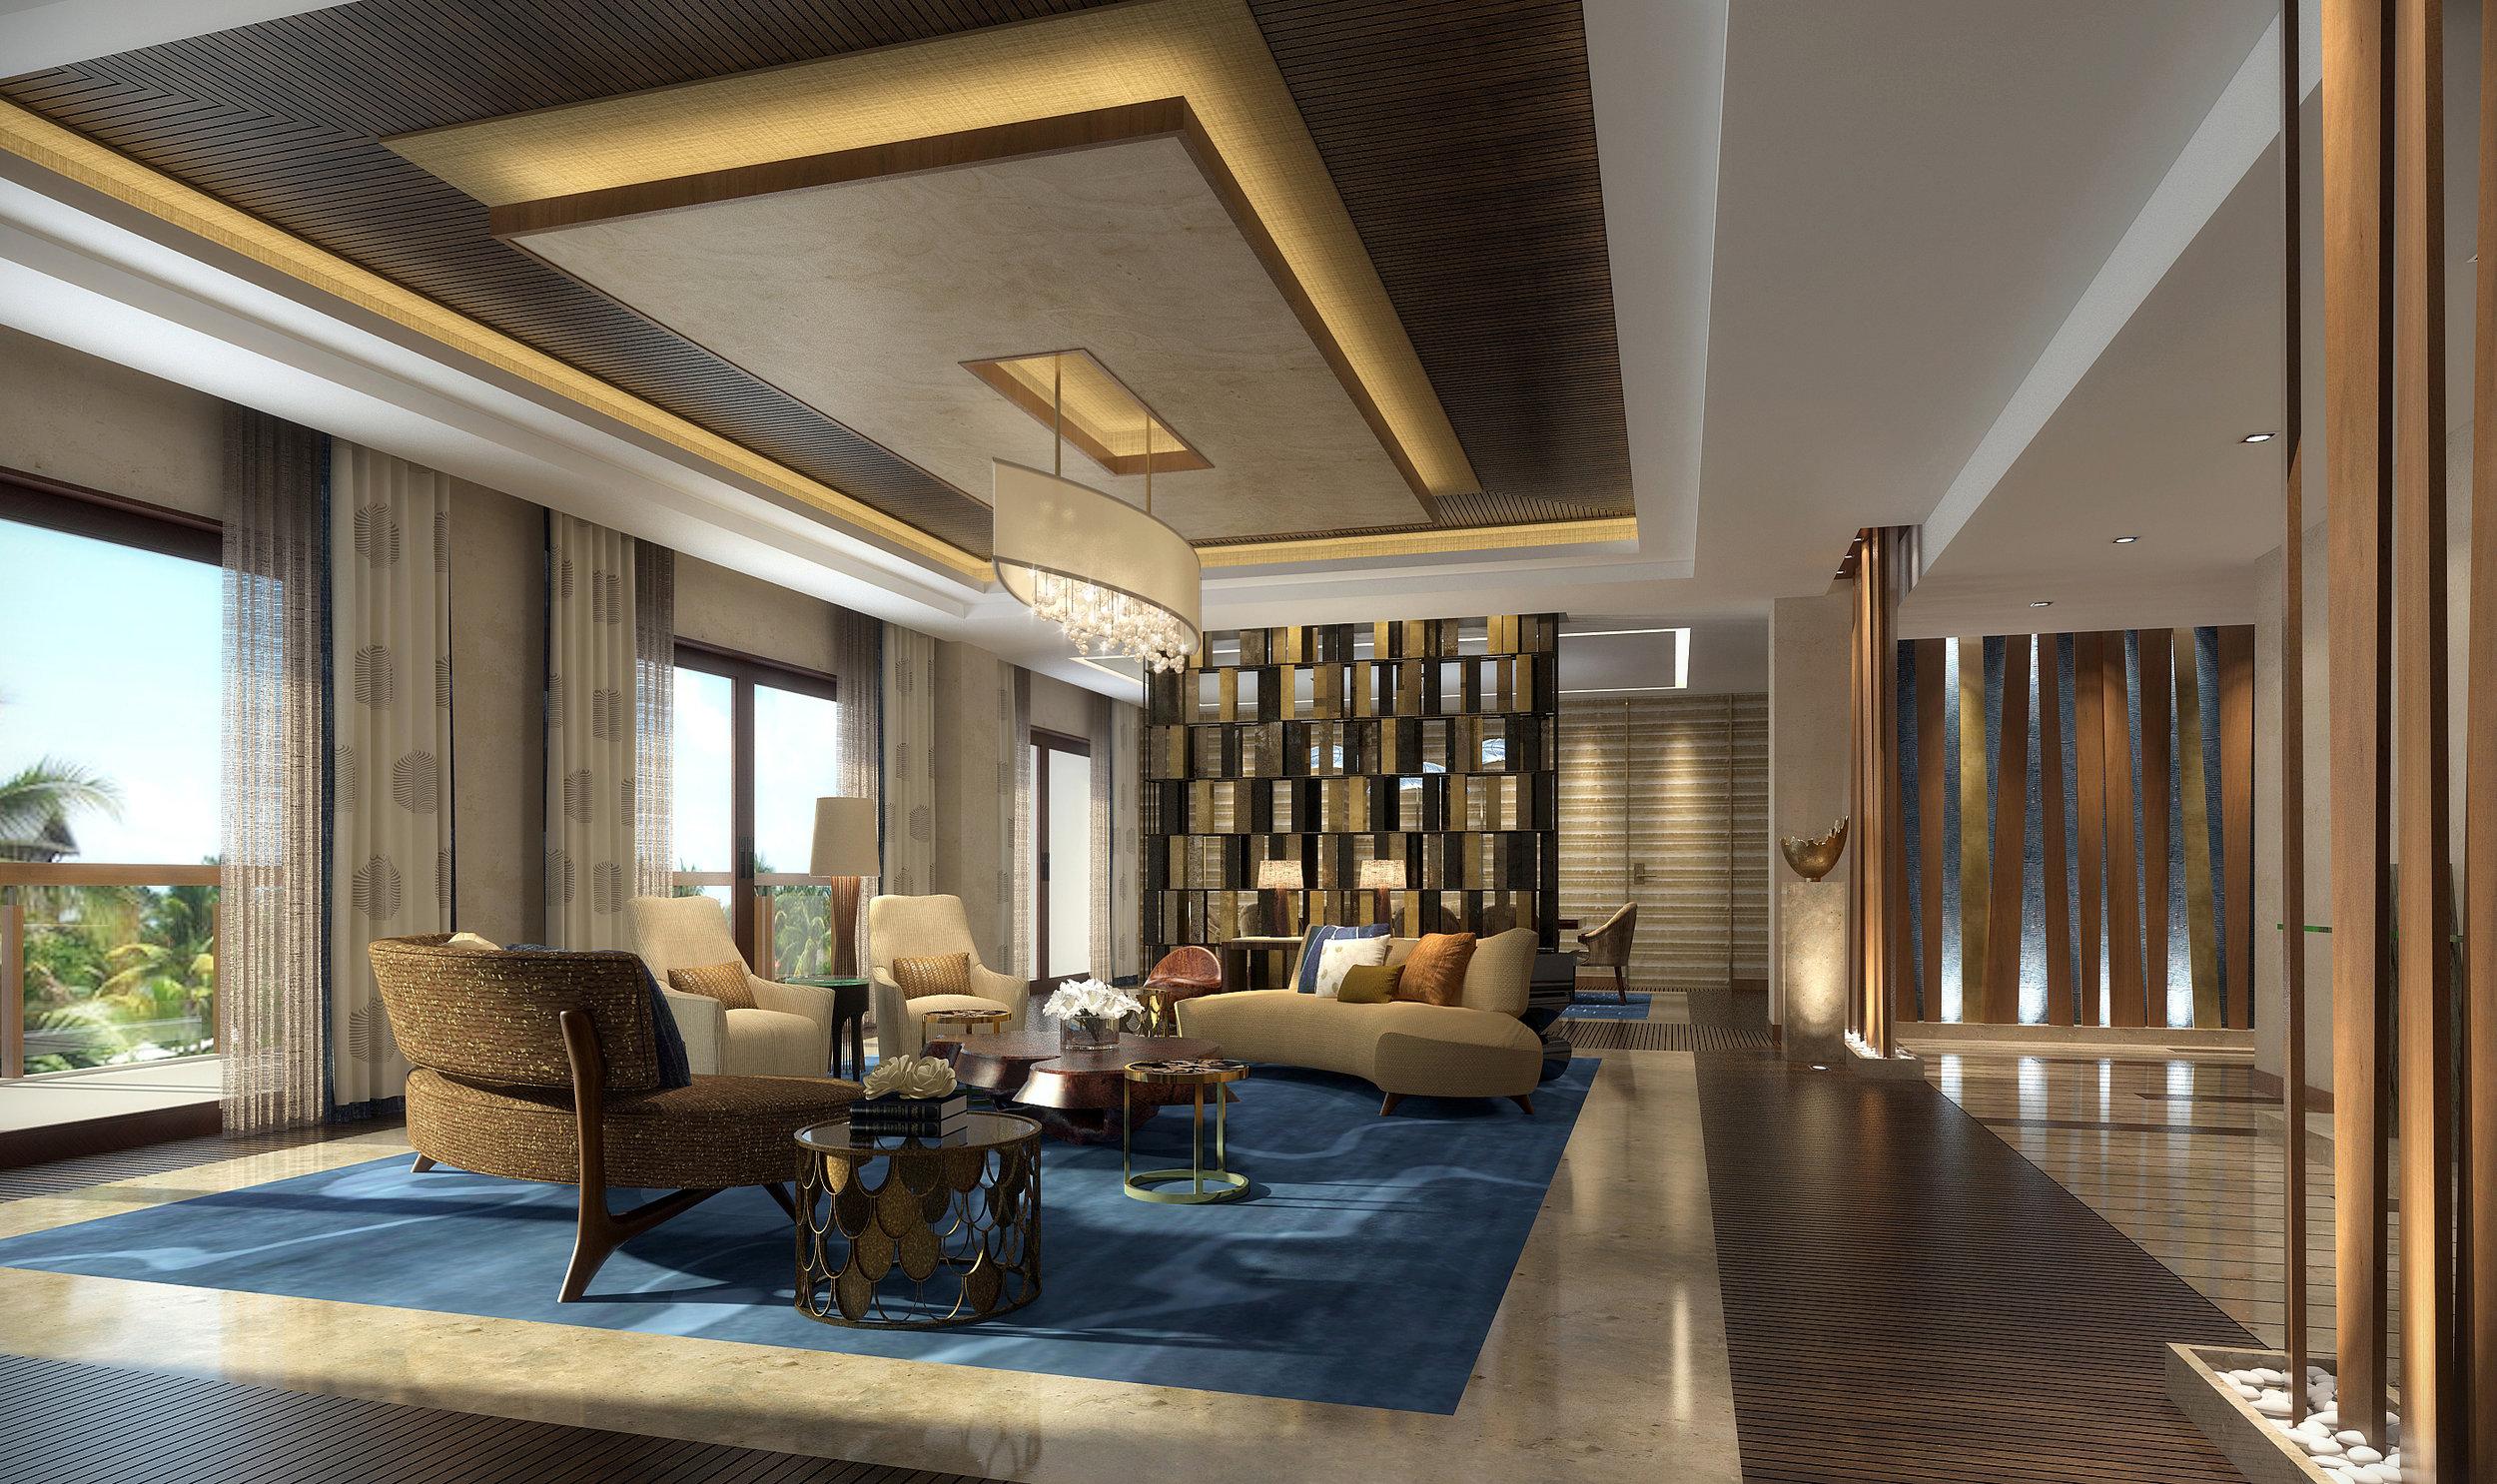 Hainan Radisson Blu Living Room.jpg